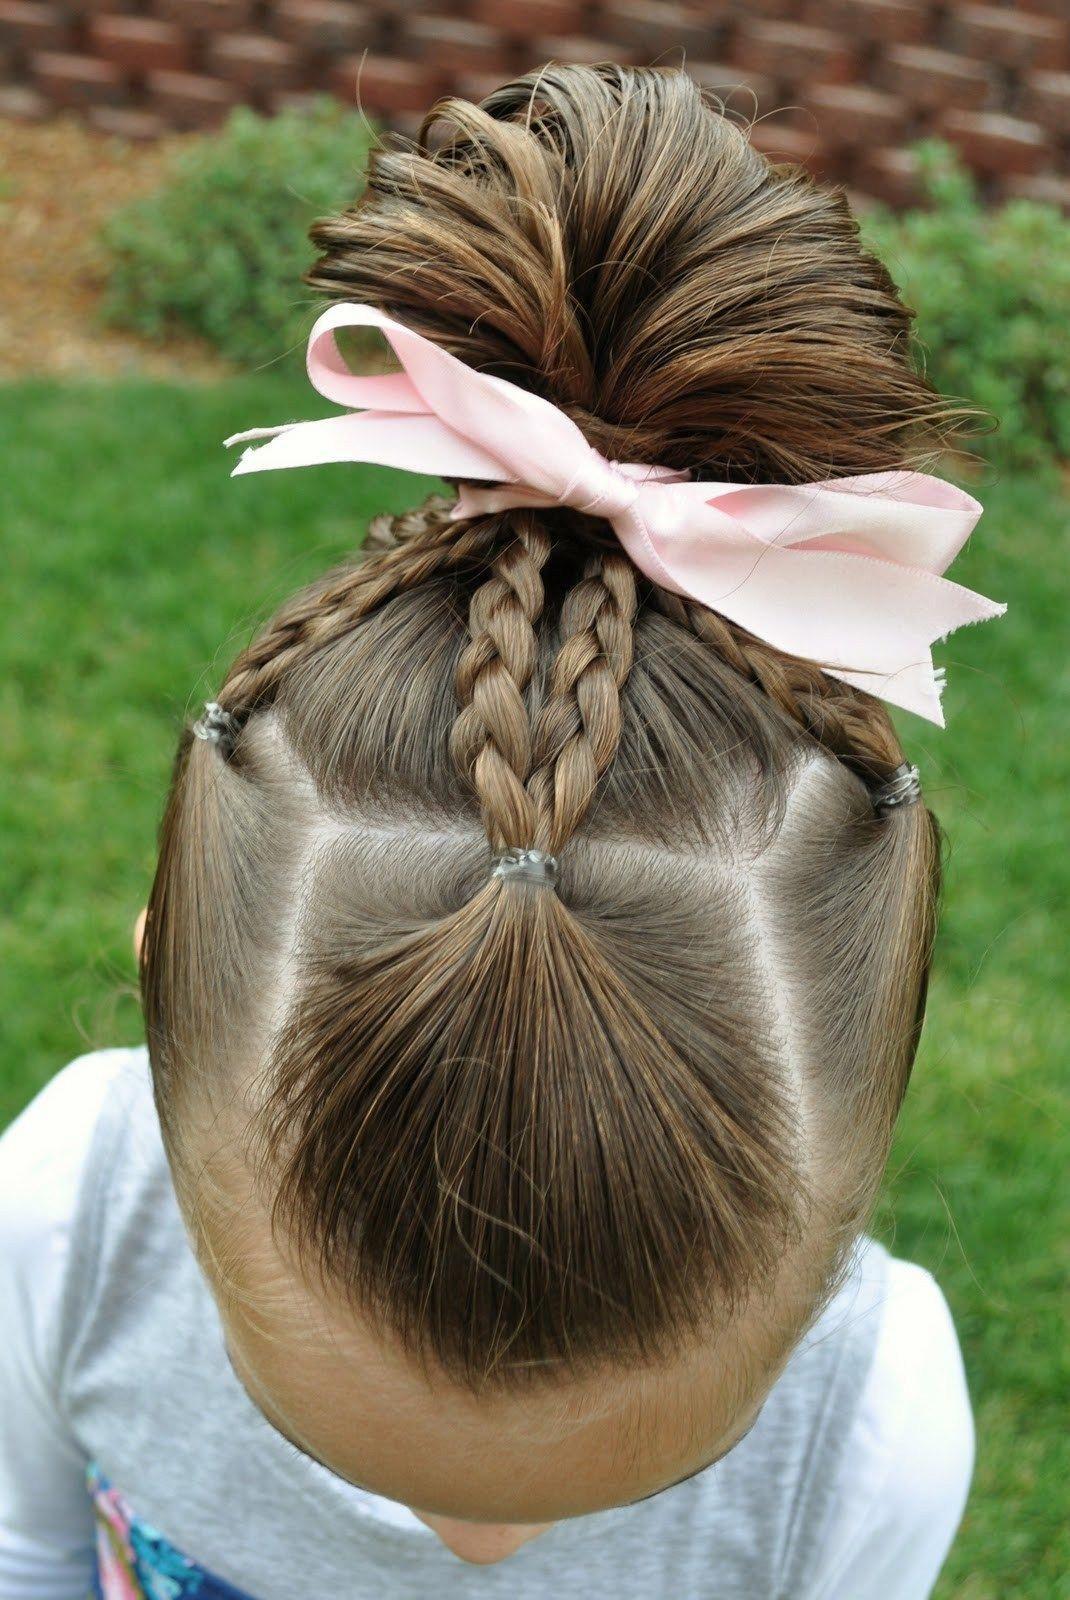 Hairstyles For Little Girls shortgirlhairstylesforteens Latest